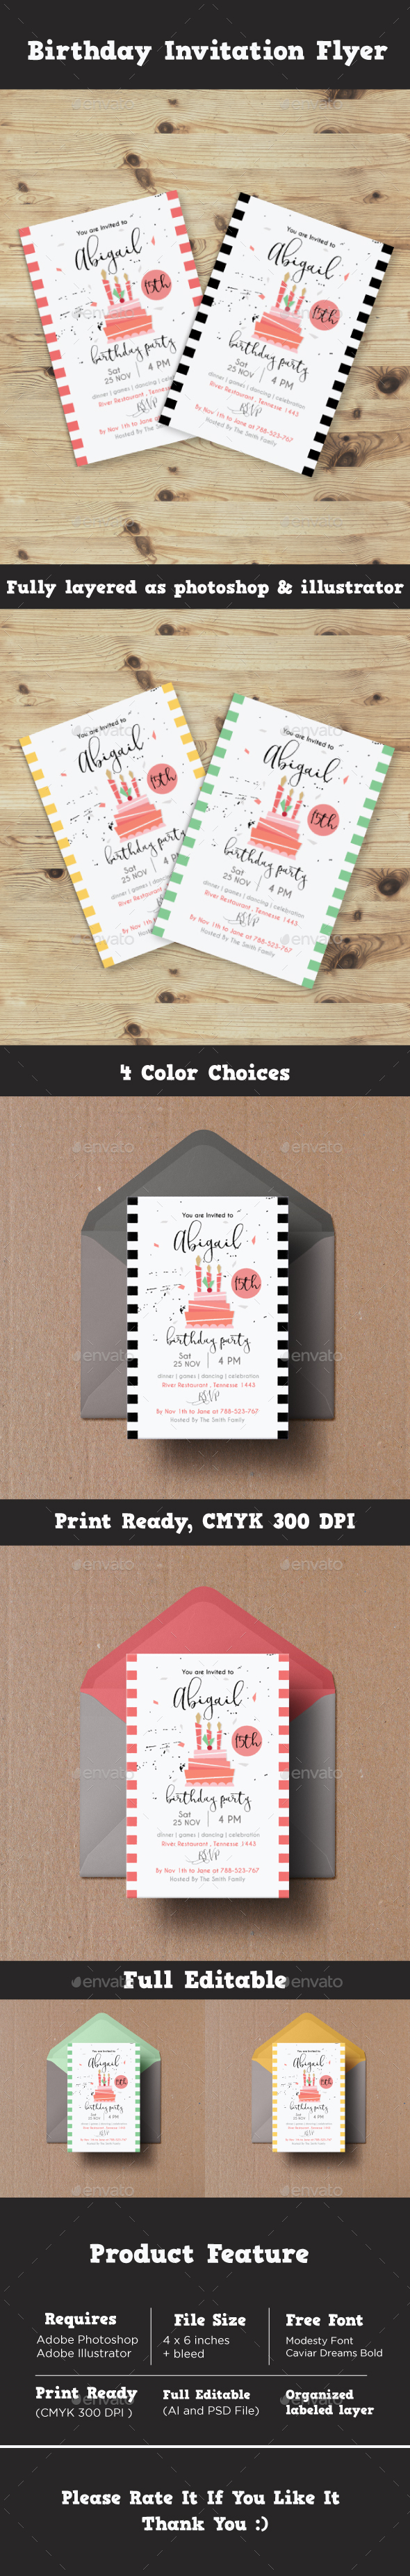 Birthday Invitation Flyer - Events Flyers